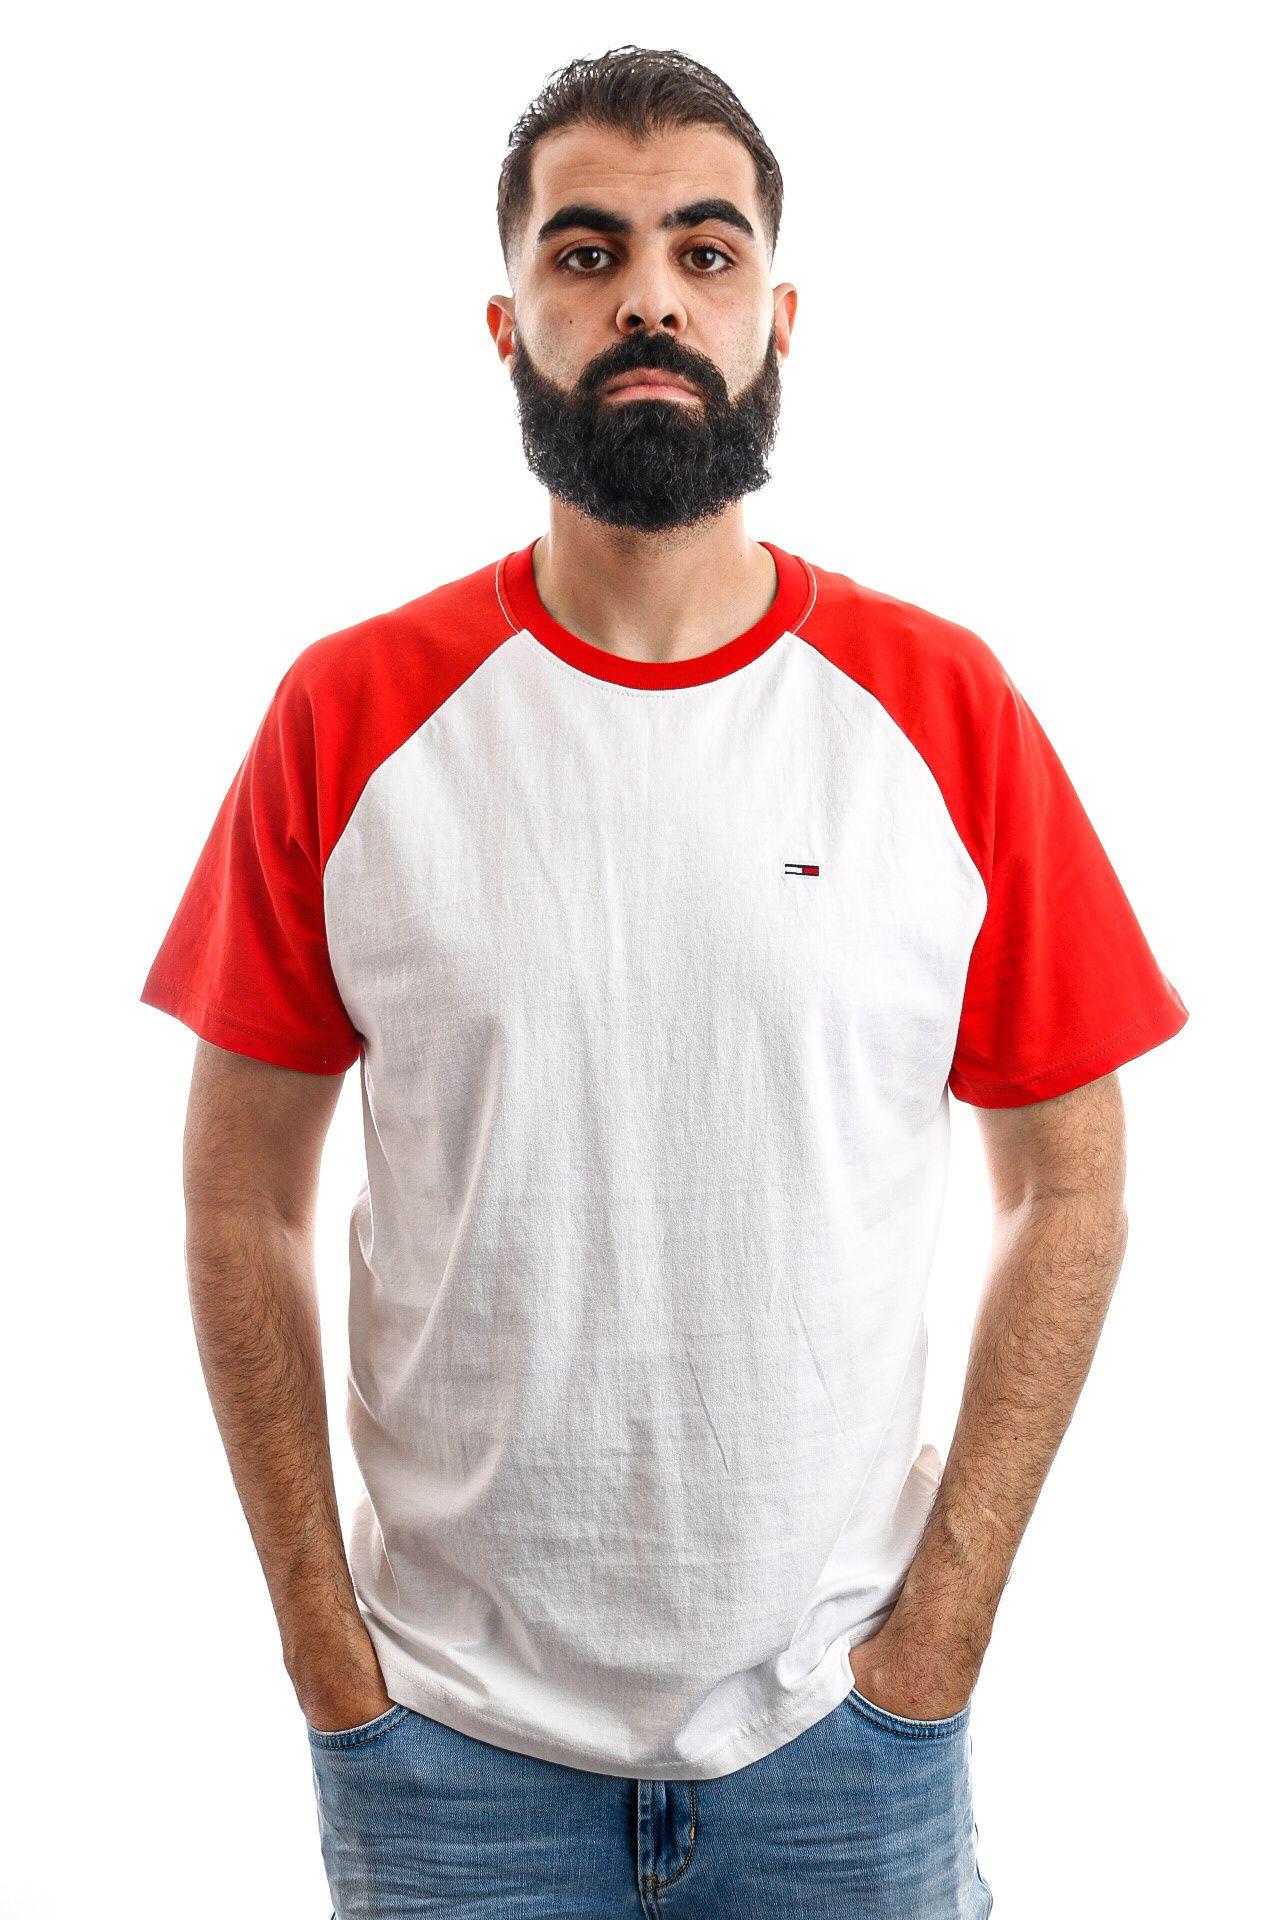 Afbeelding van Tommy Hilfiger T-shirt TJM CONTRAST SLEEVE, 667 Flame Scarlet / Multi DM0DM06545